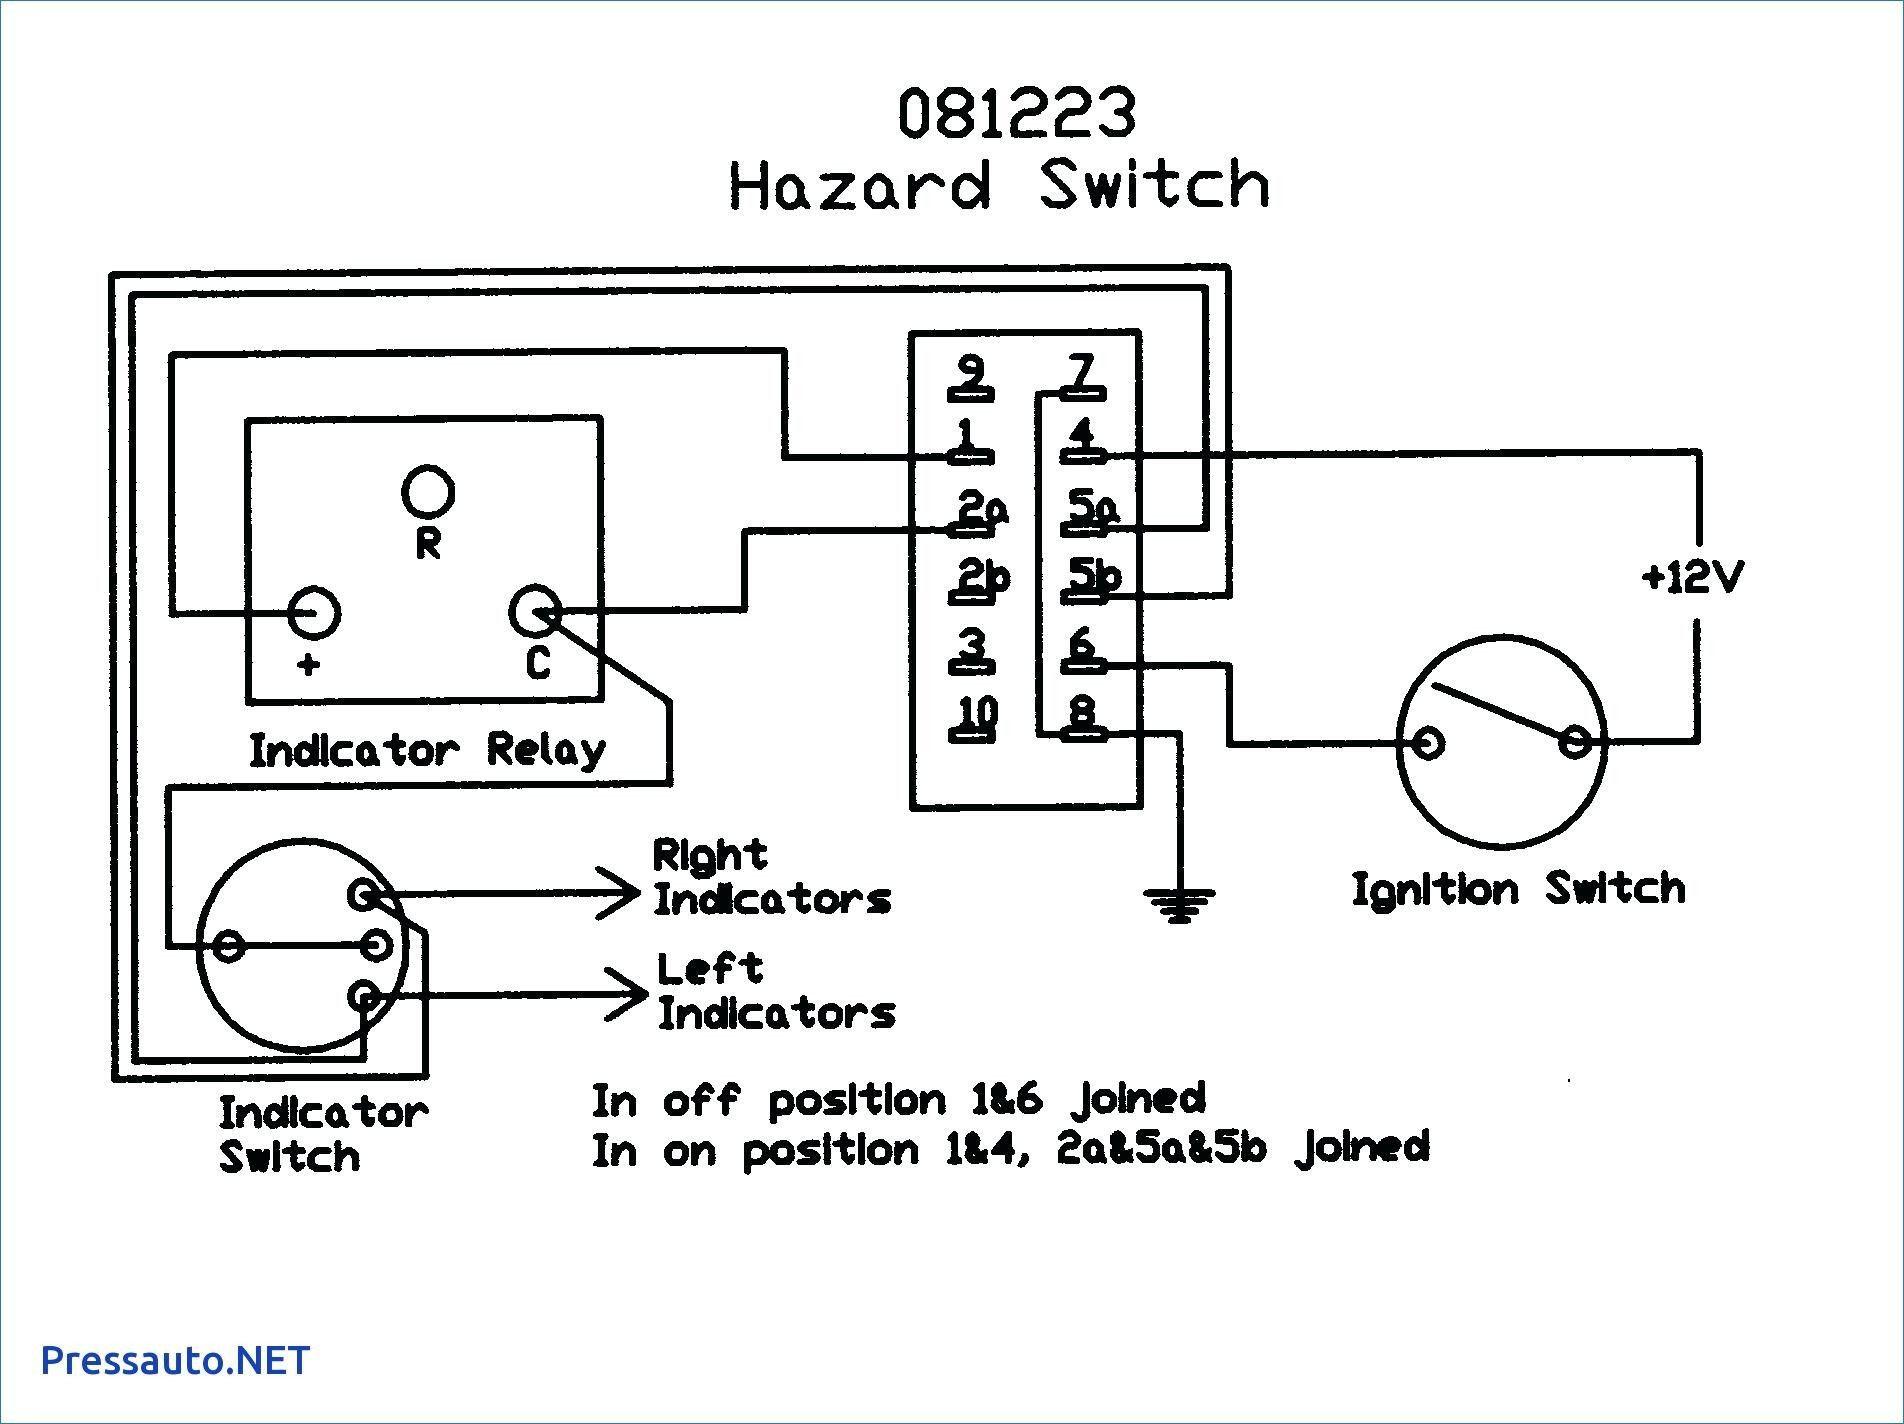 wiring diagram for motorcycle hazard lights awesome wiring diagram for motorcycle hazard lights diagrams  awesome wiring diagram for motorcycle